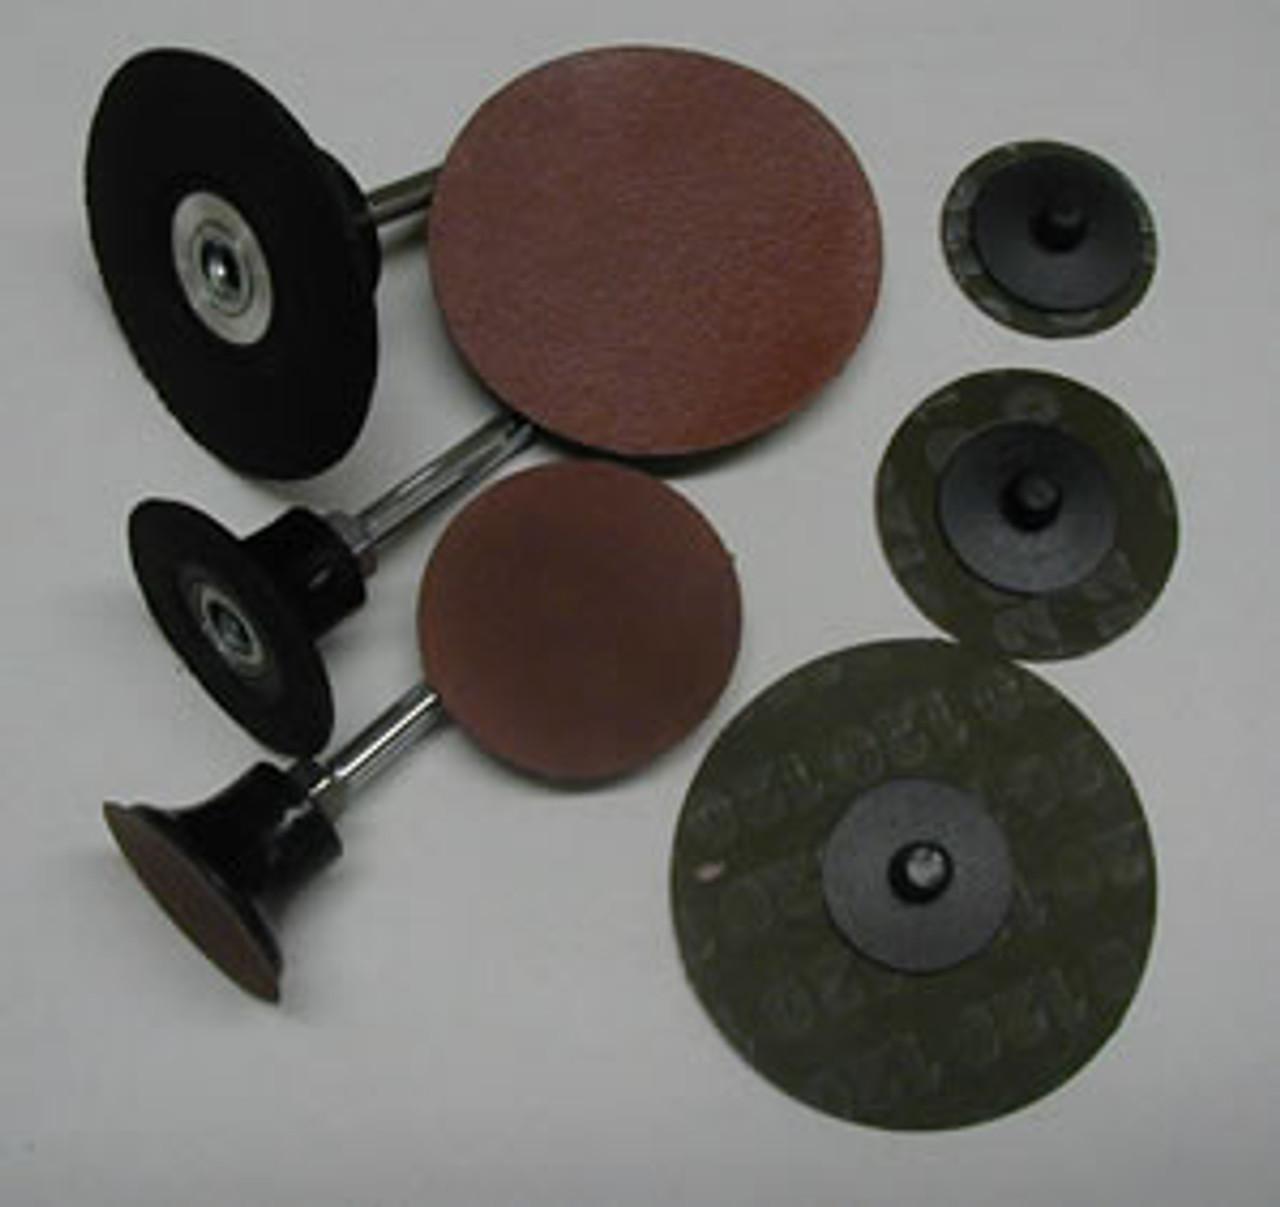 "Aluminum Oxide Sanding Disk 2"" - 120 Grit"